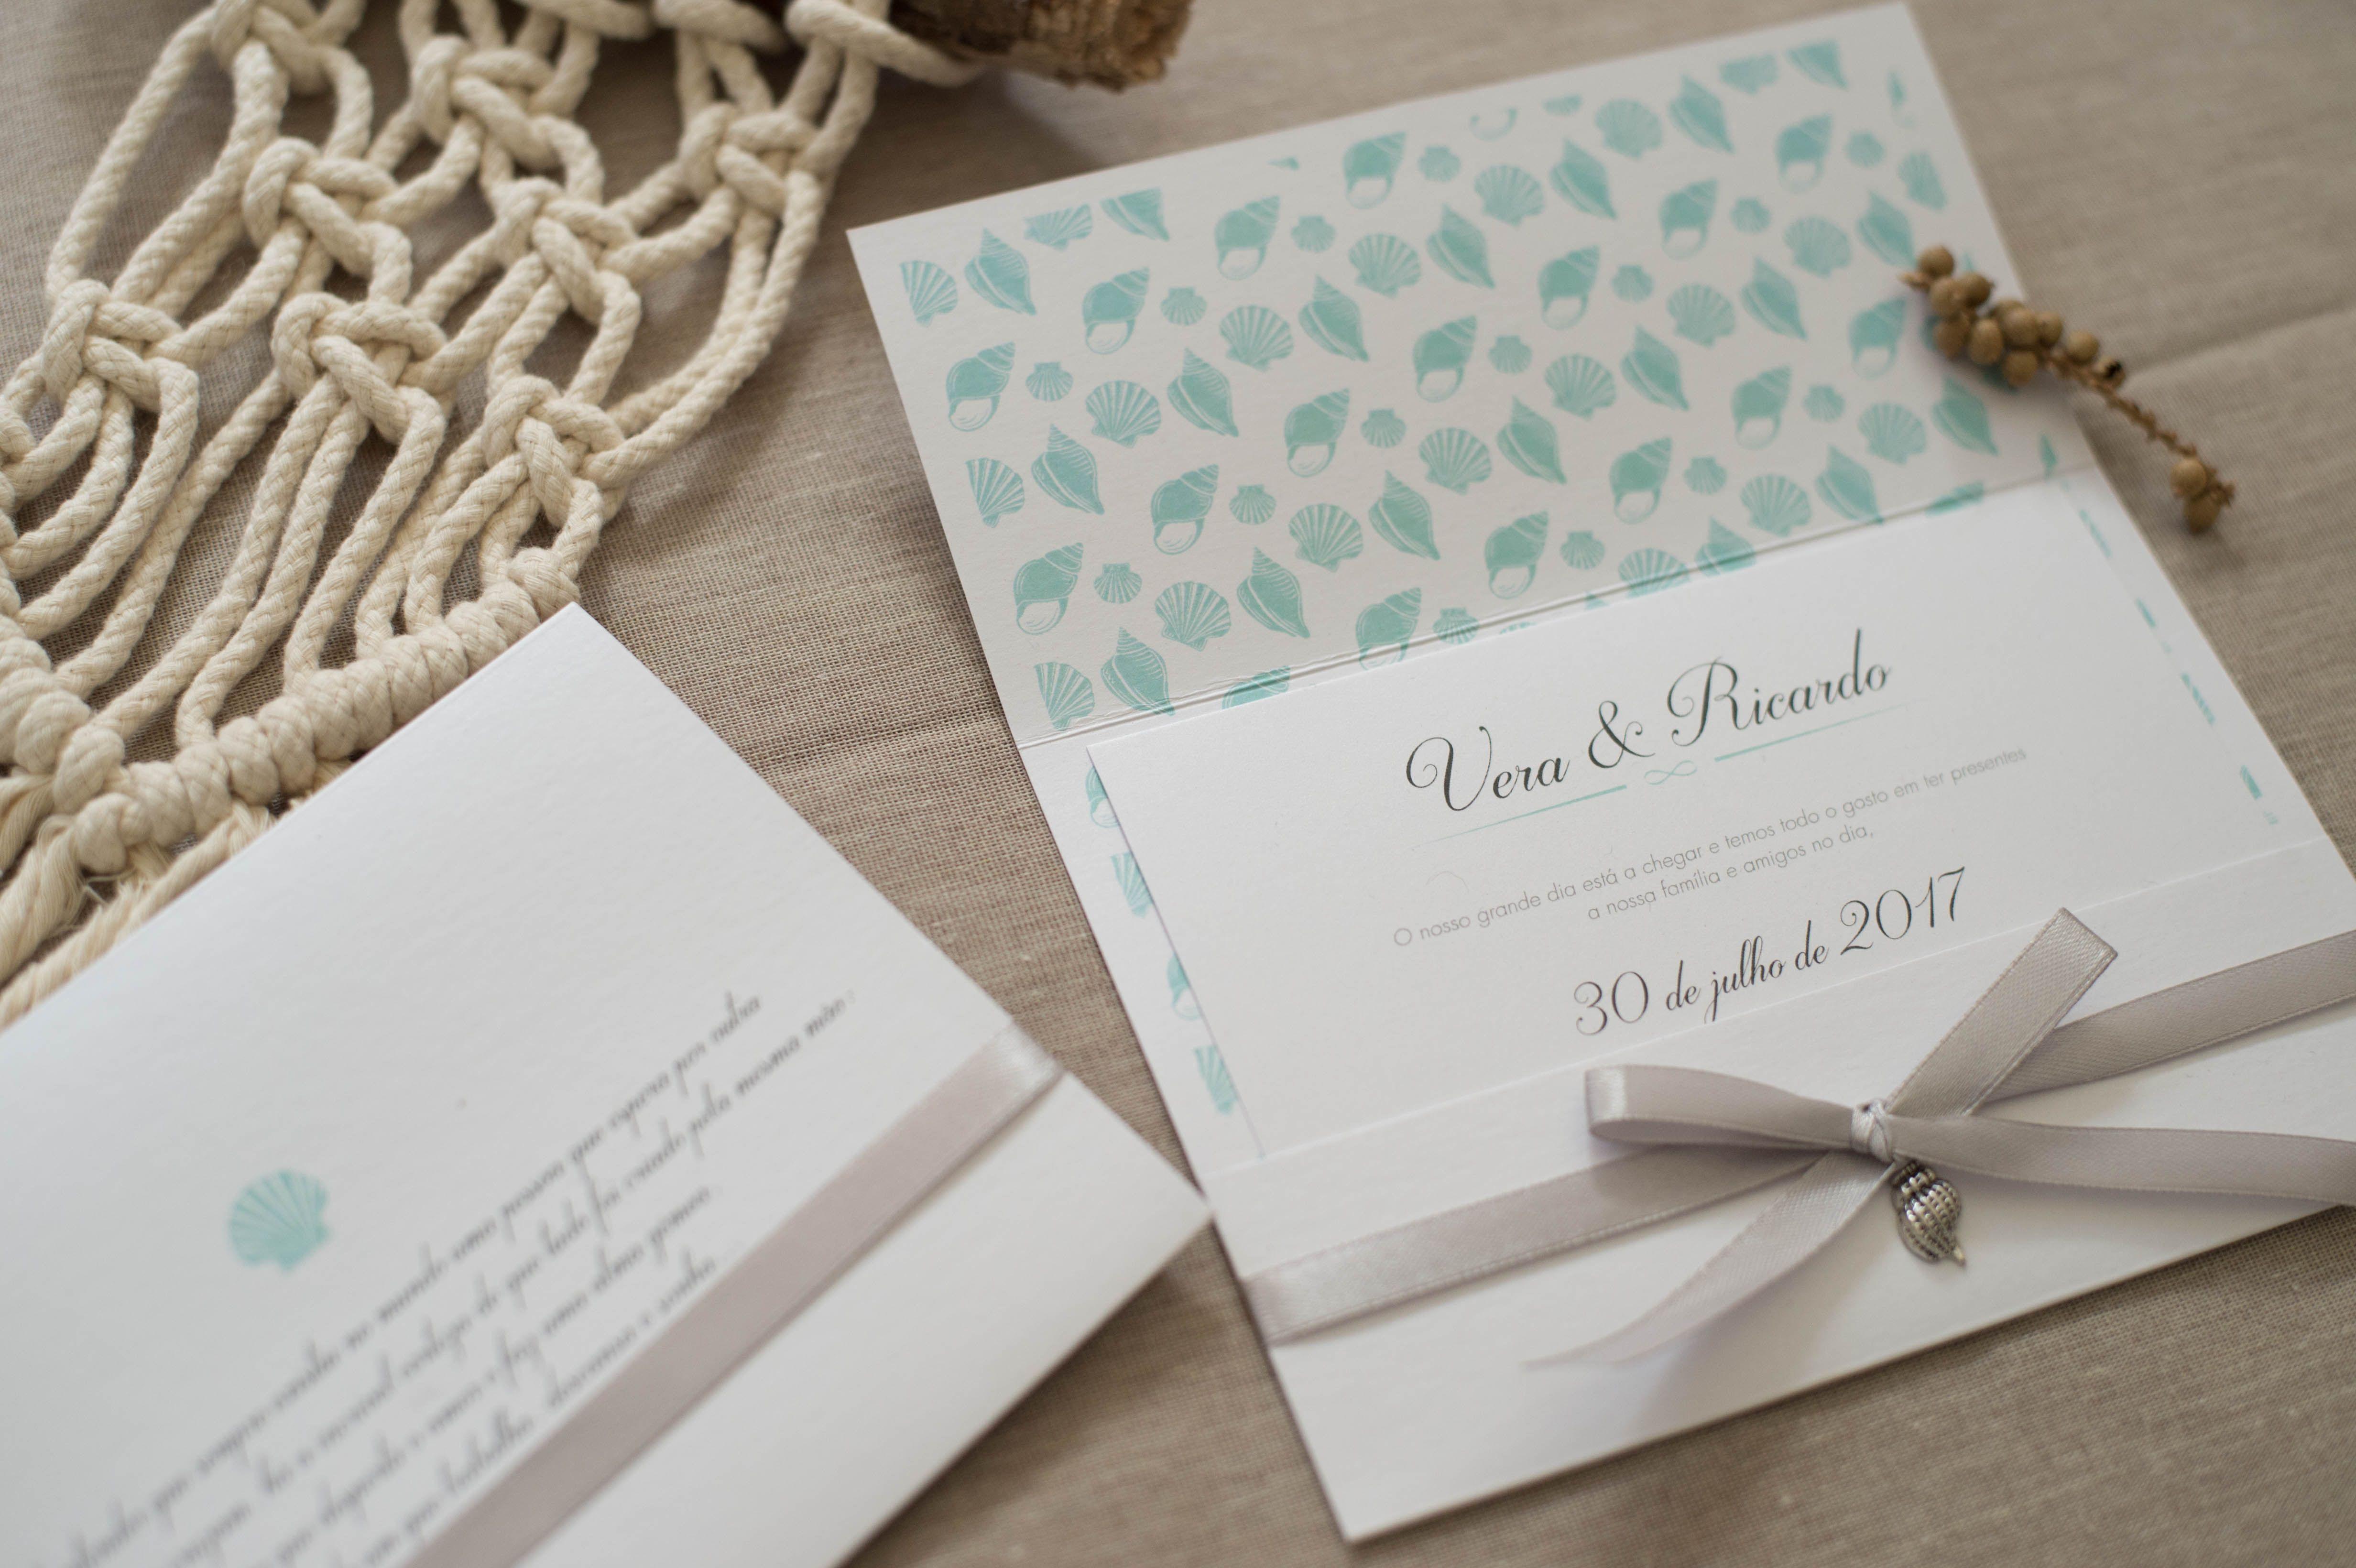 beach theme wedding invitations in tones of blue and grey | Wedding ...